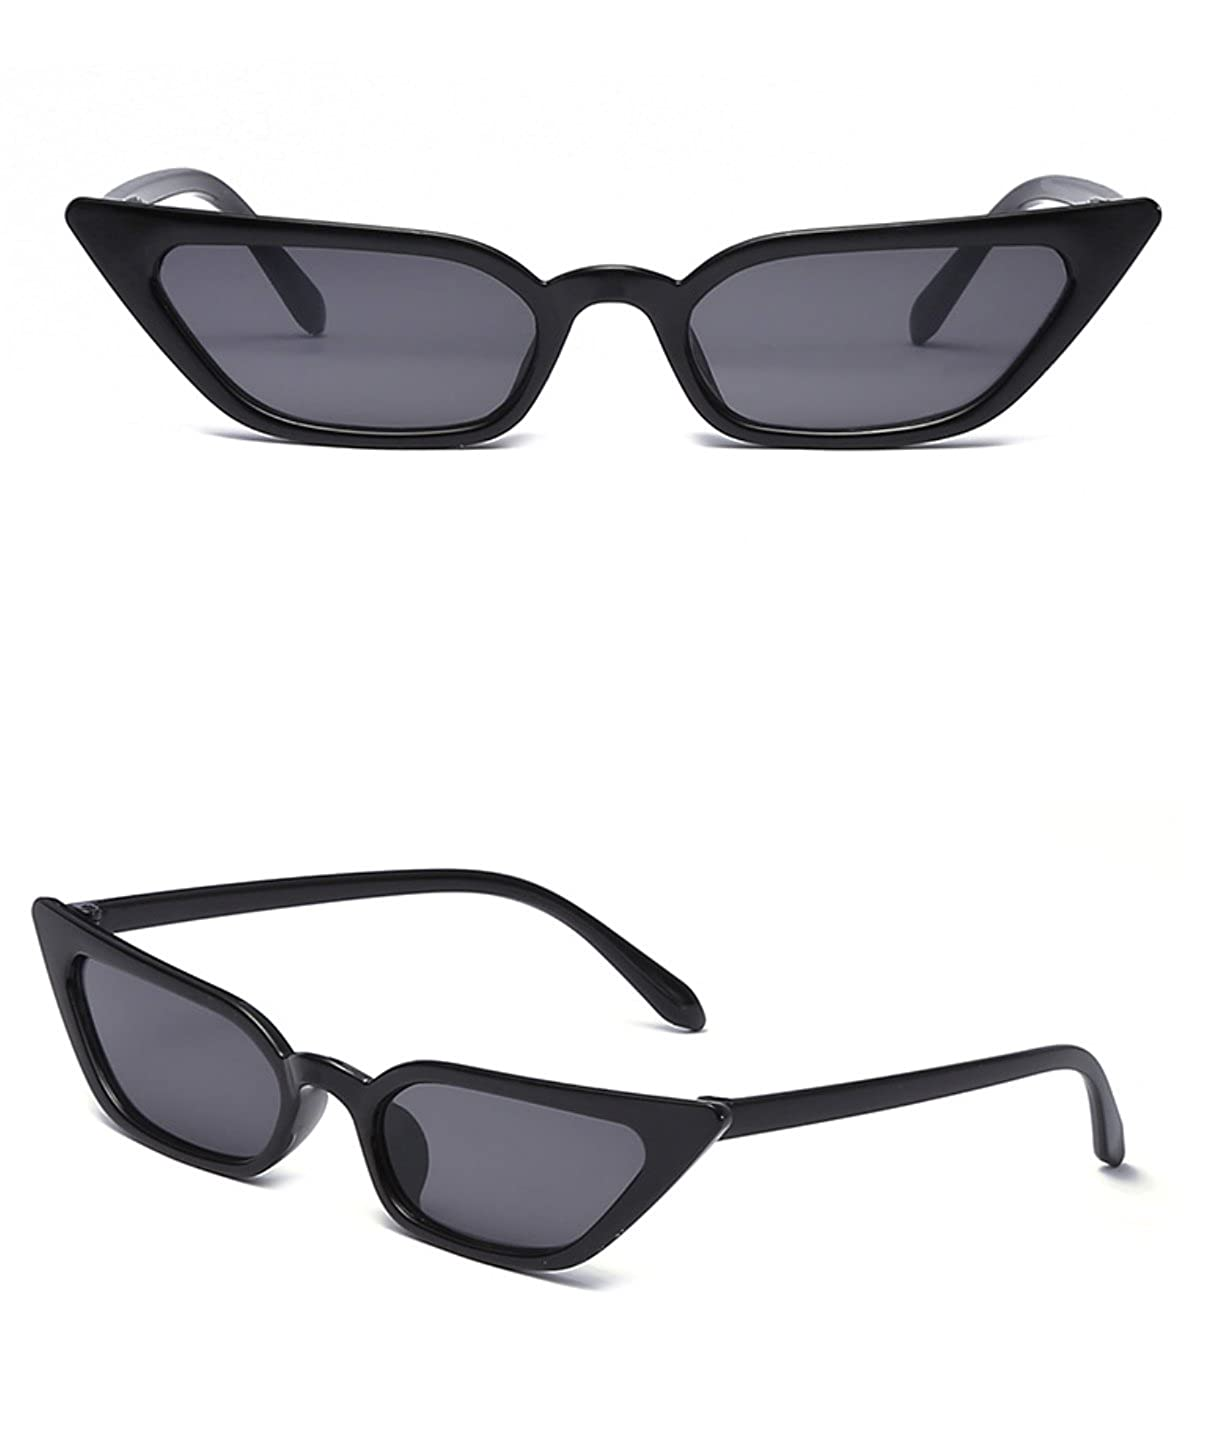 3eab66cf352f Amazon.com: Small Frame Skinny Cat Eye Sunglasses for Women Colorful Mini  Narrow Square Retro Cateye Vintage Sunglasses by W&Y YING: Shoes